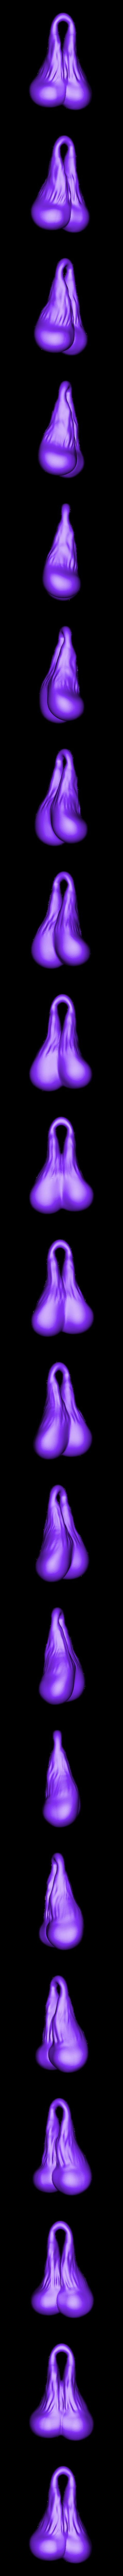 balls 2.OBJ Download OBJ file Scary movie Hanging Balls door knocker • 3D printing object, paulienet